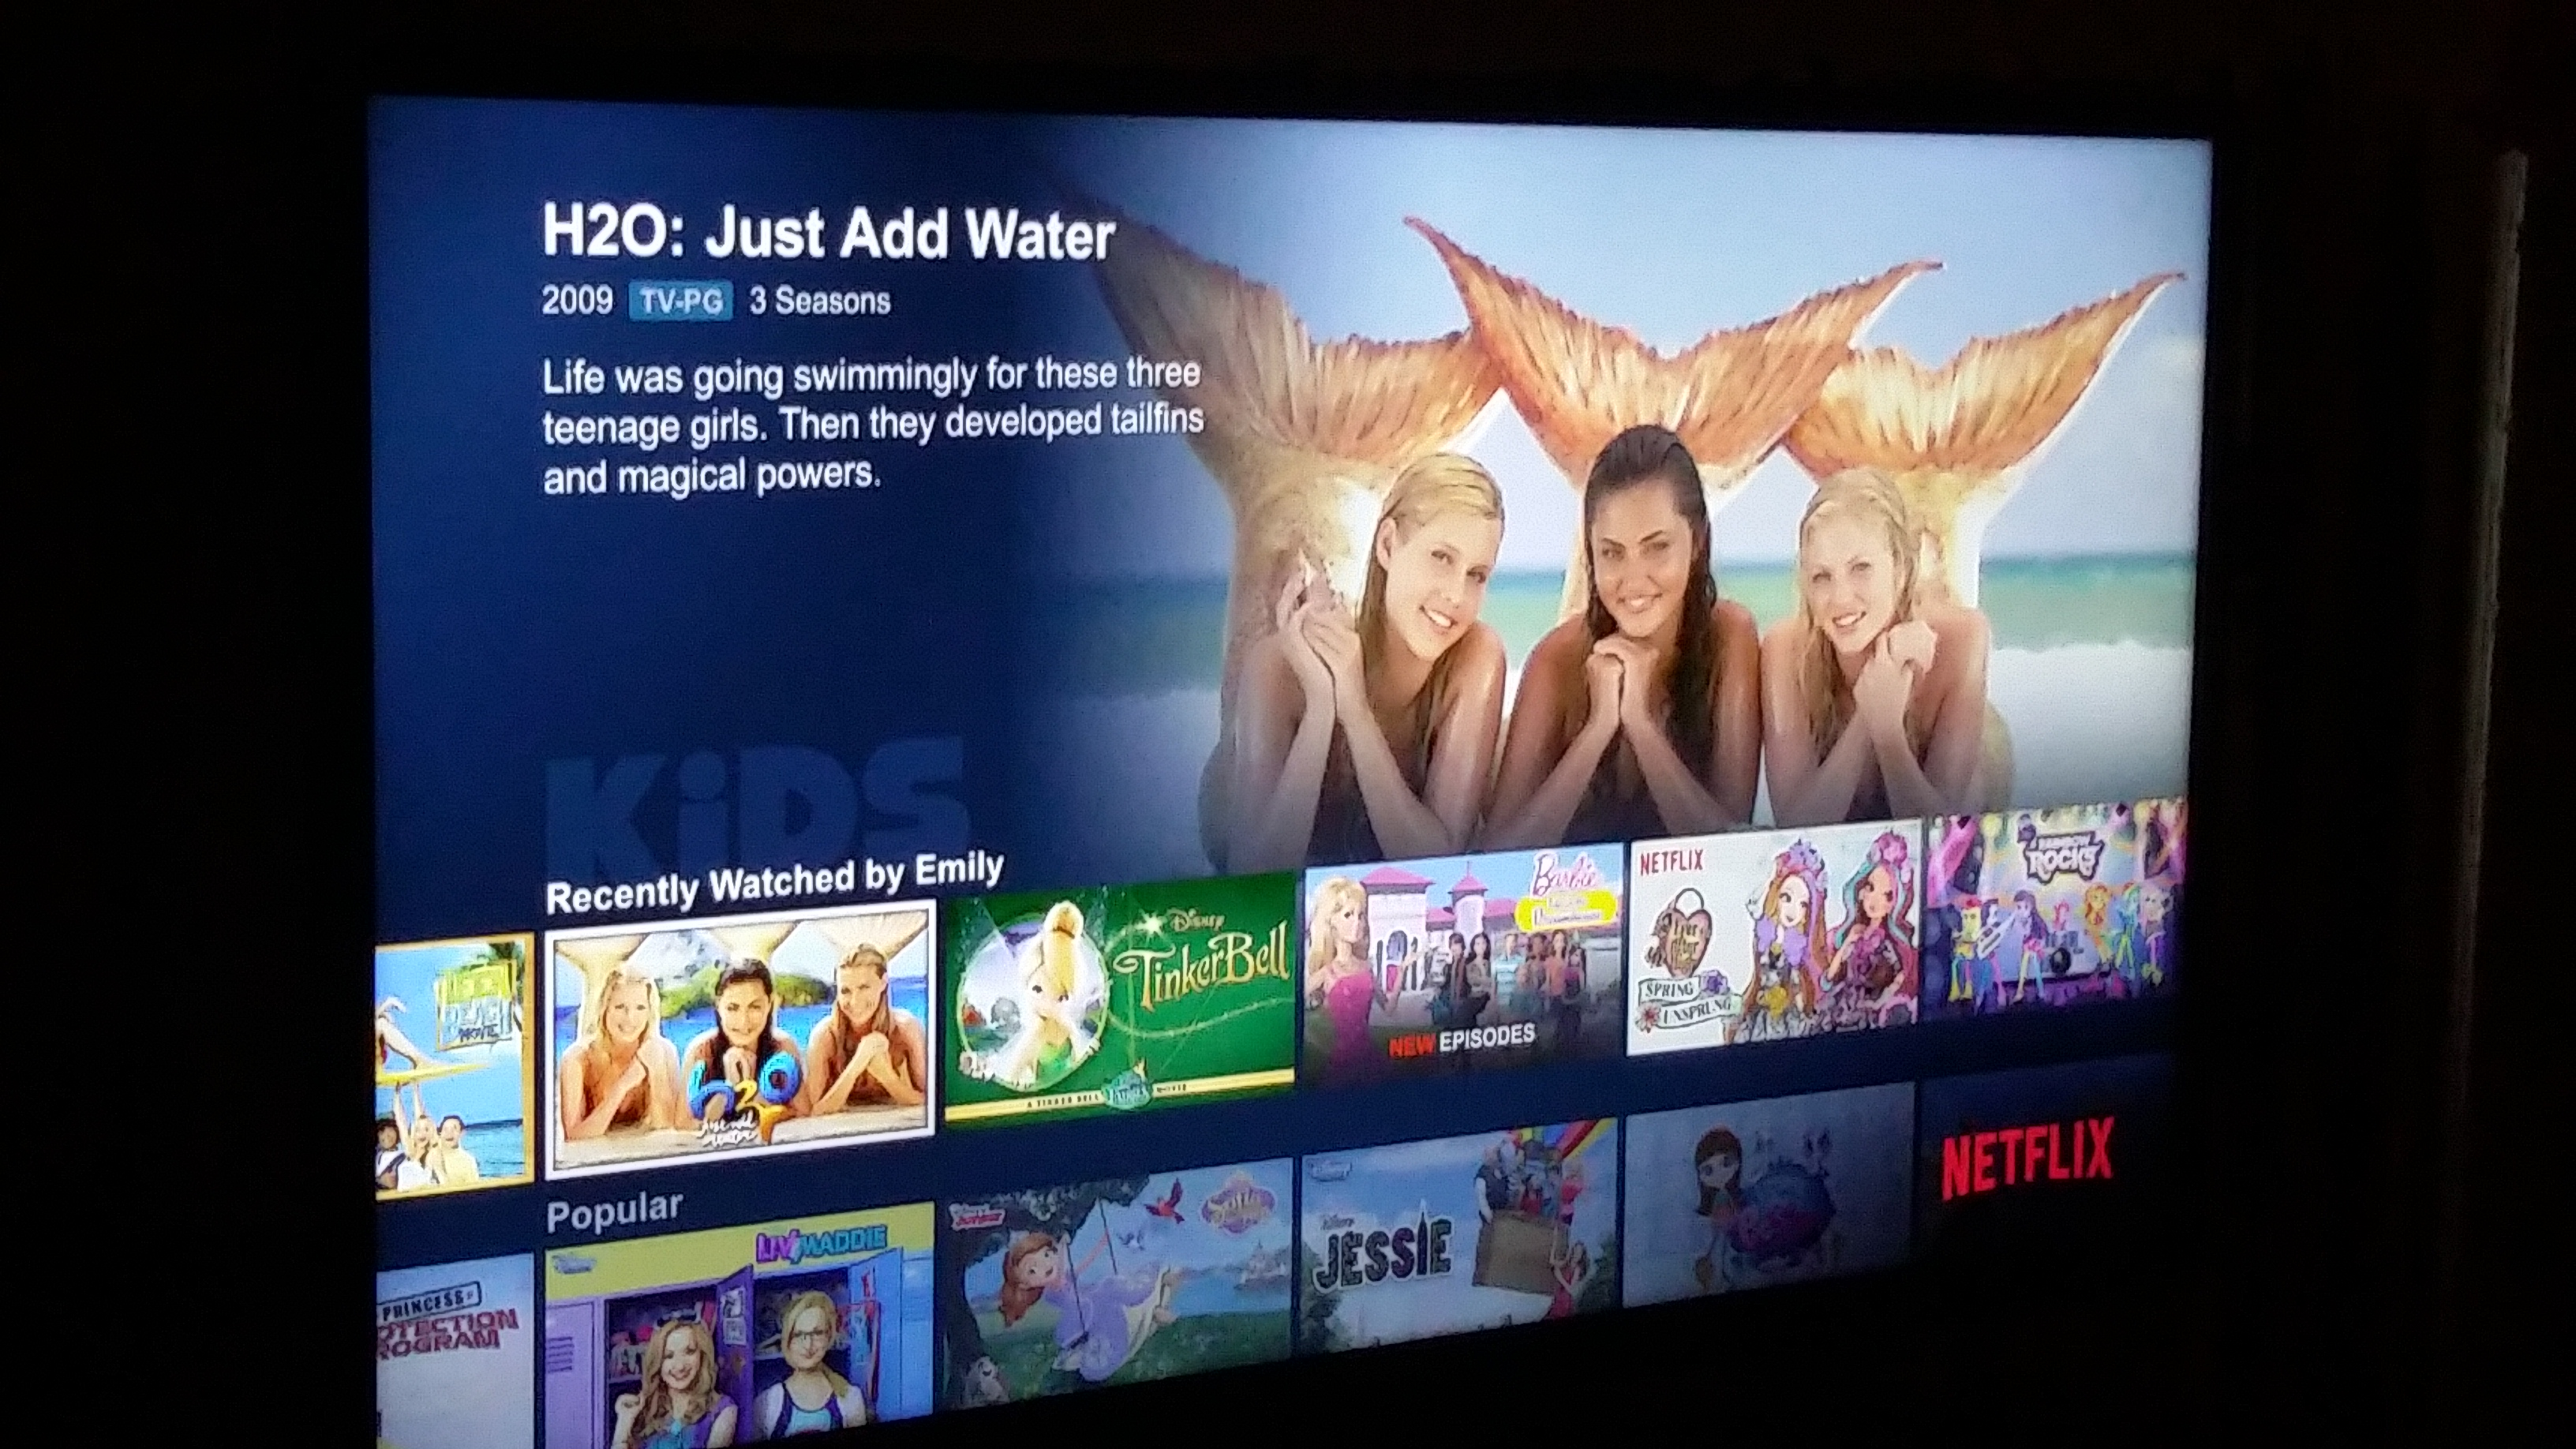 Netflix keeping us happy netflixstreamteam h2ojustaddwater for H20 just add water seasons